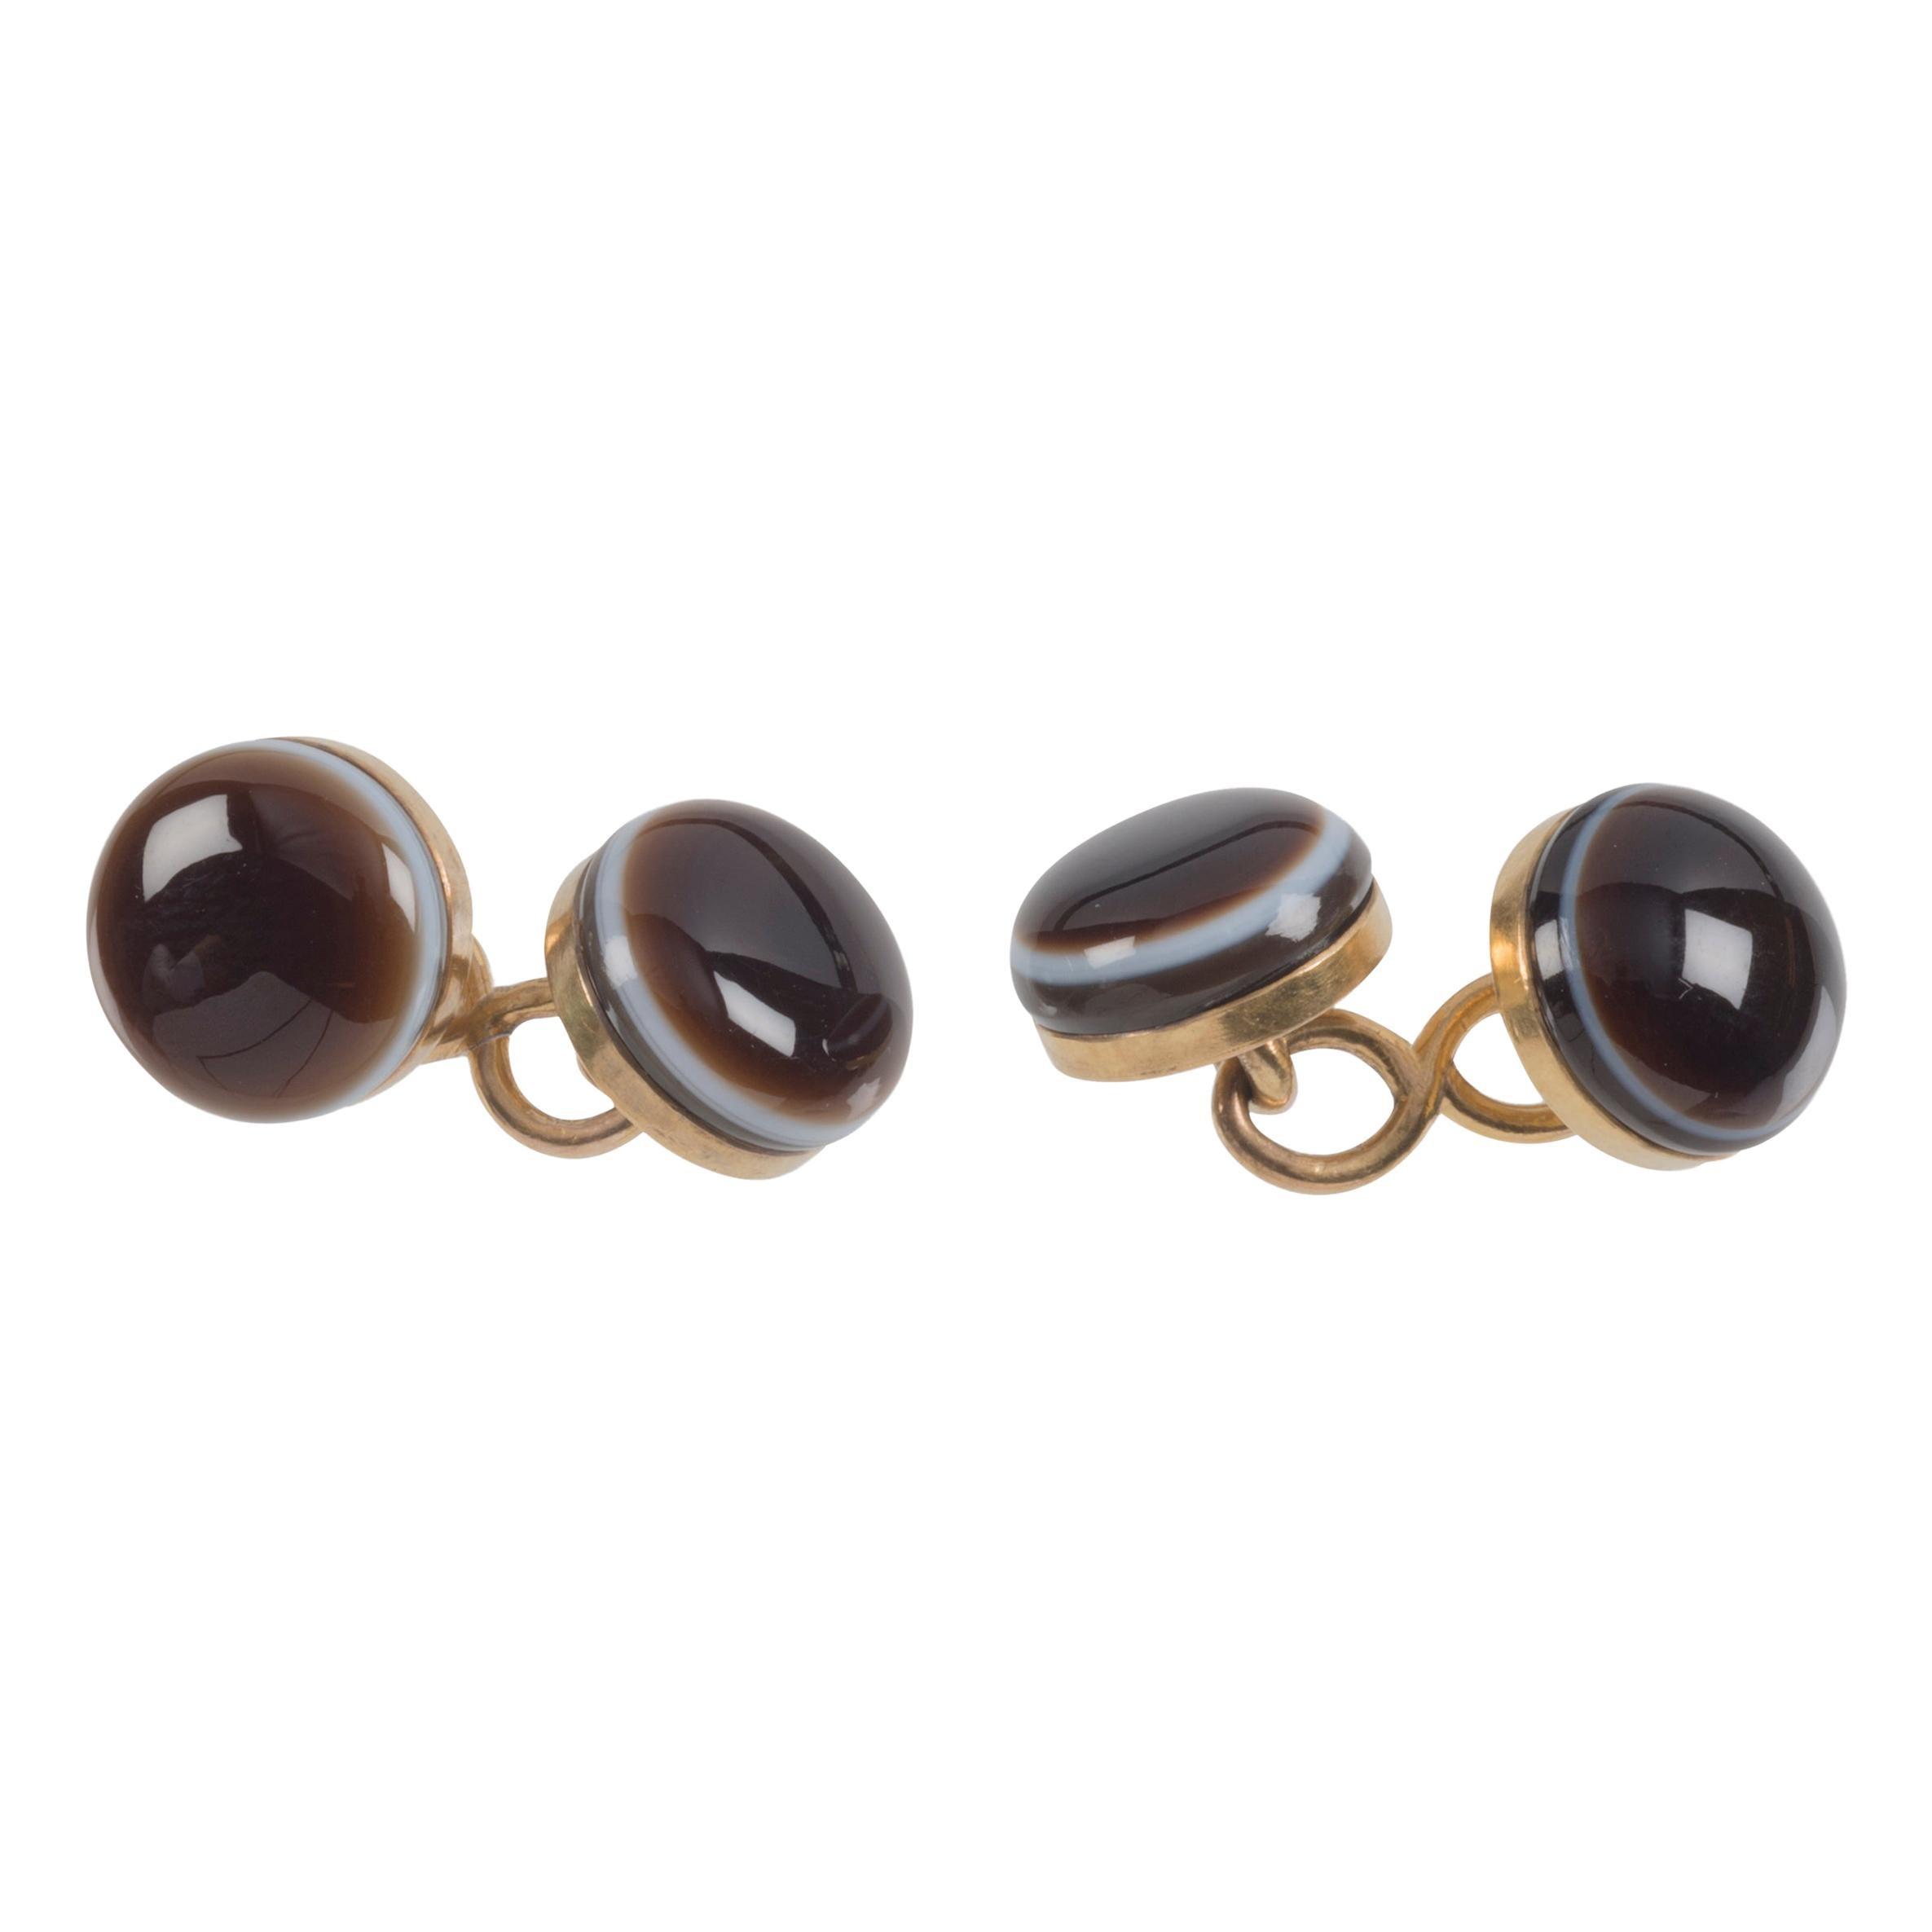 Antique Victorian Banded Agate Sardonyx Eye Gold Cufflinks